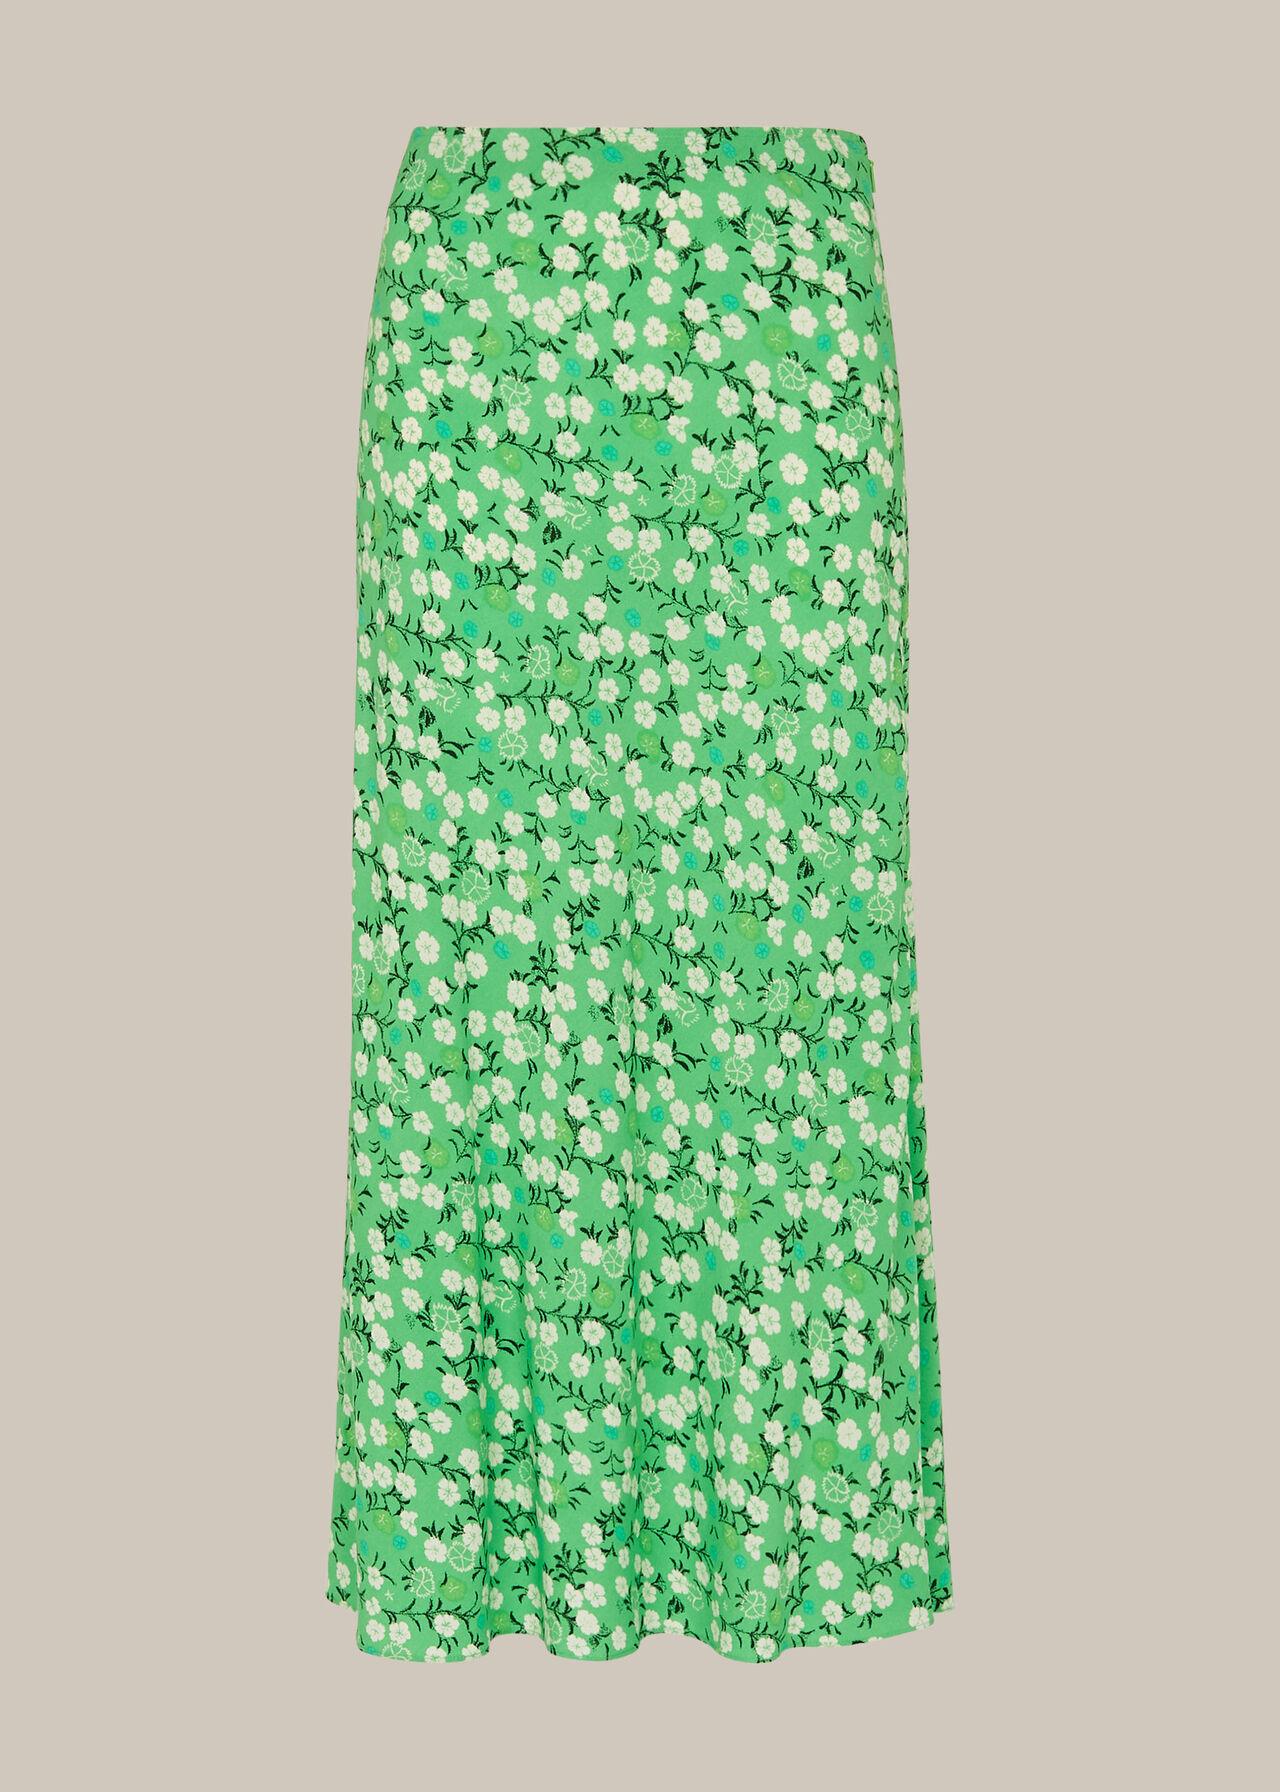 Cherry Blossom Bias Cut Skirt